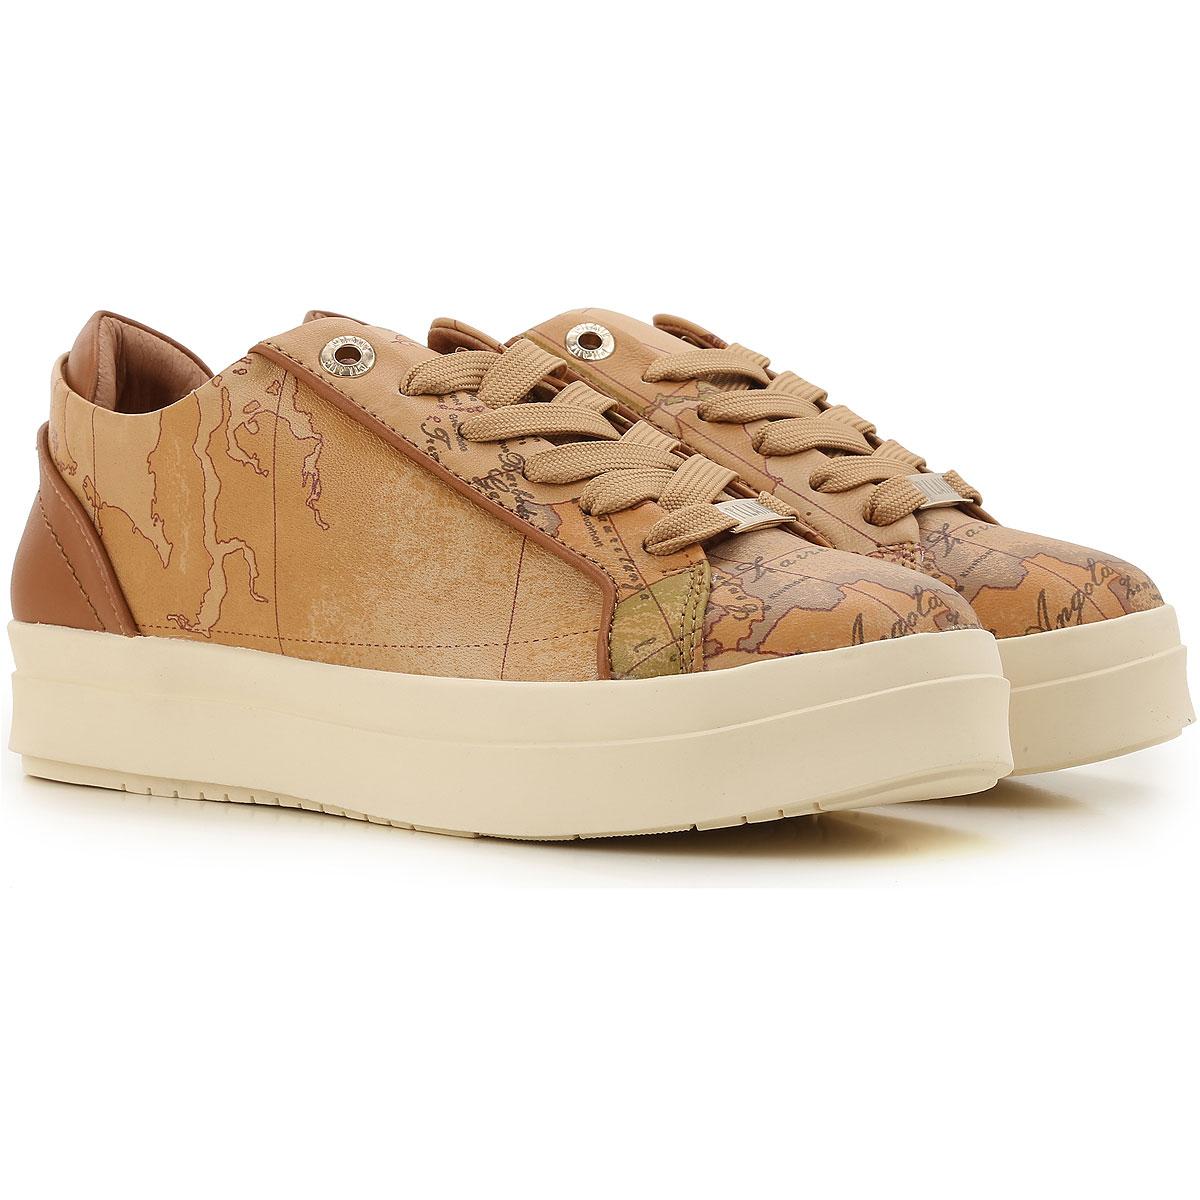 Alviero Martini Sneaker Femme, Marron cuir, Cuir, 2017, 35 36 37 39 40